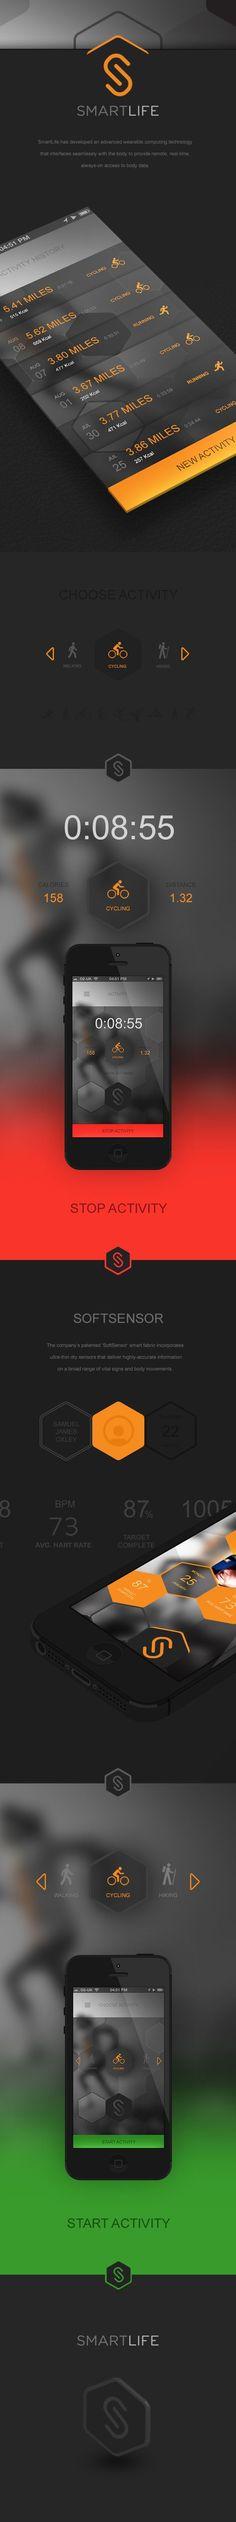 Inspiration Mobile #6 : Ergonomies et design   Blog du Webdesign